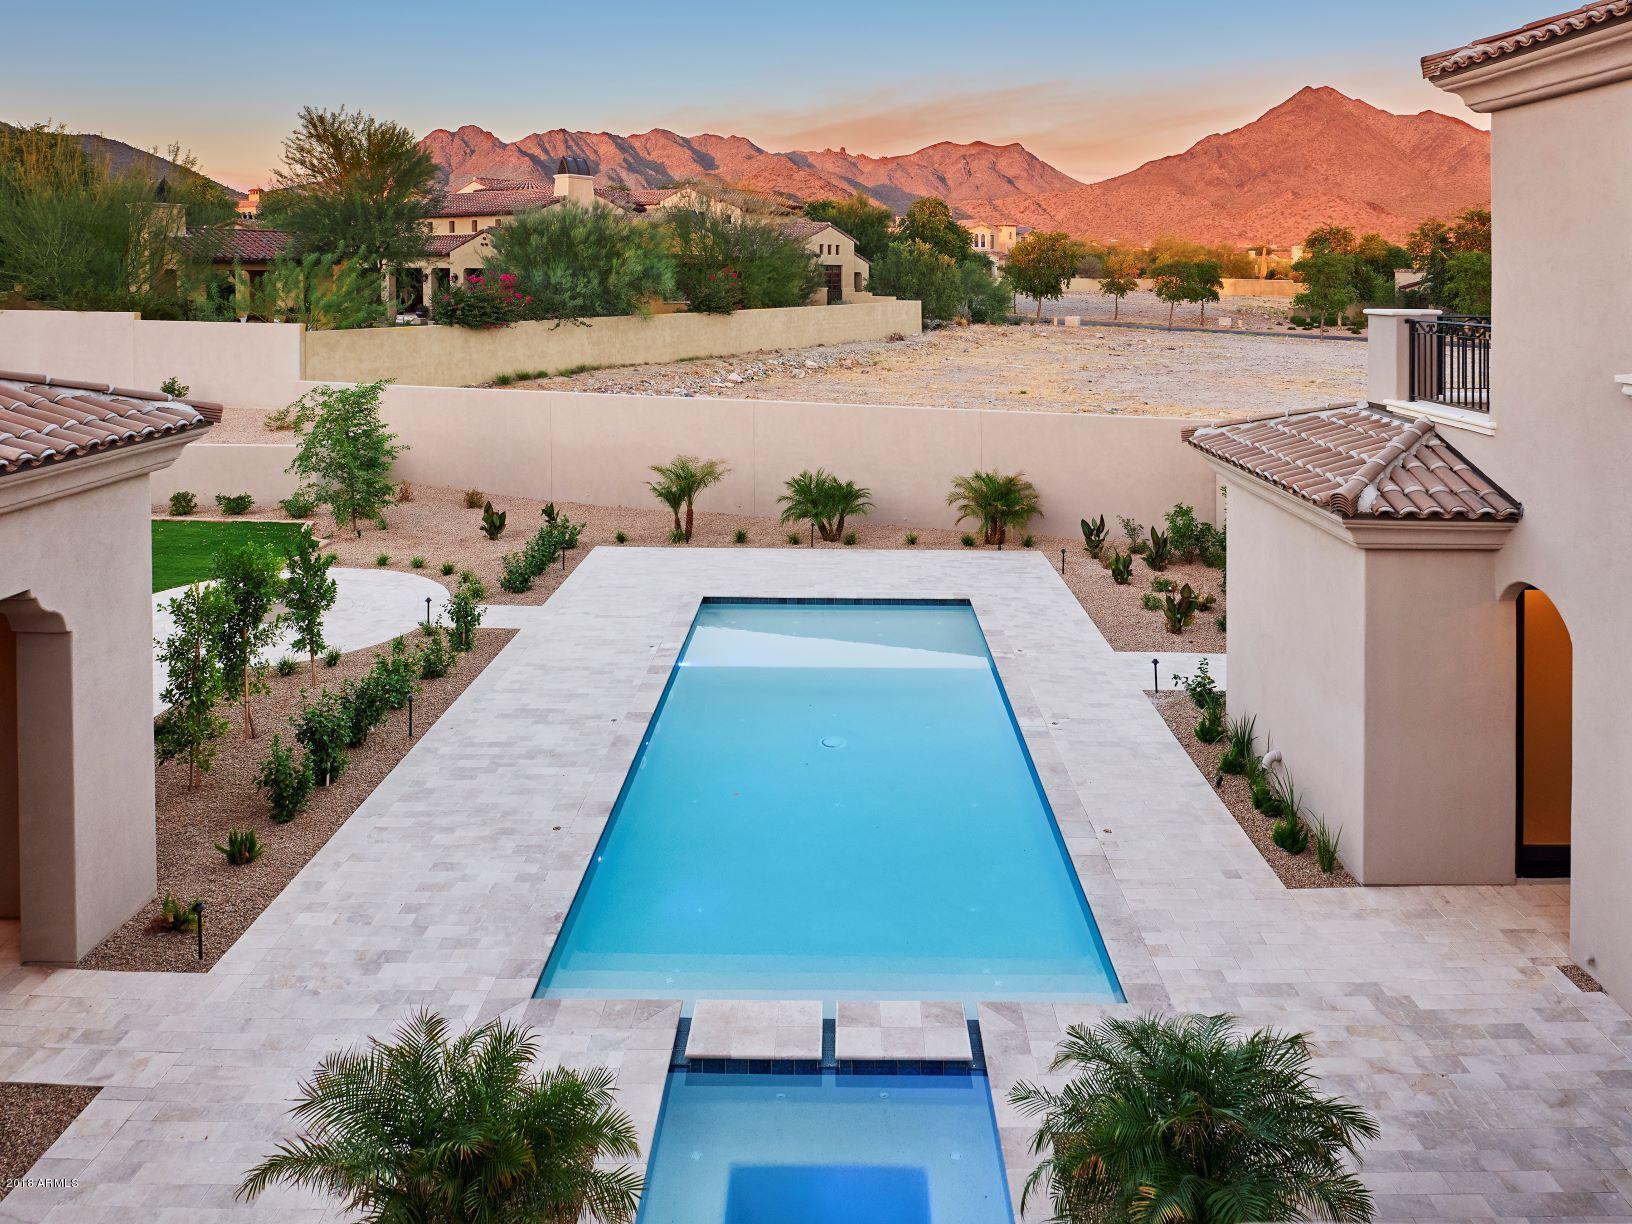 MLS 5661406 19083 E DAISY Pass, Scottsdale, AZ 85255 Scottsdale AZ Silverleaf